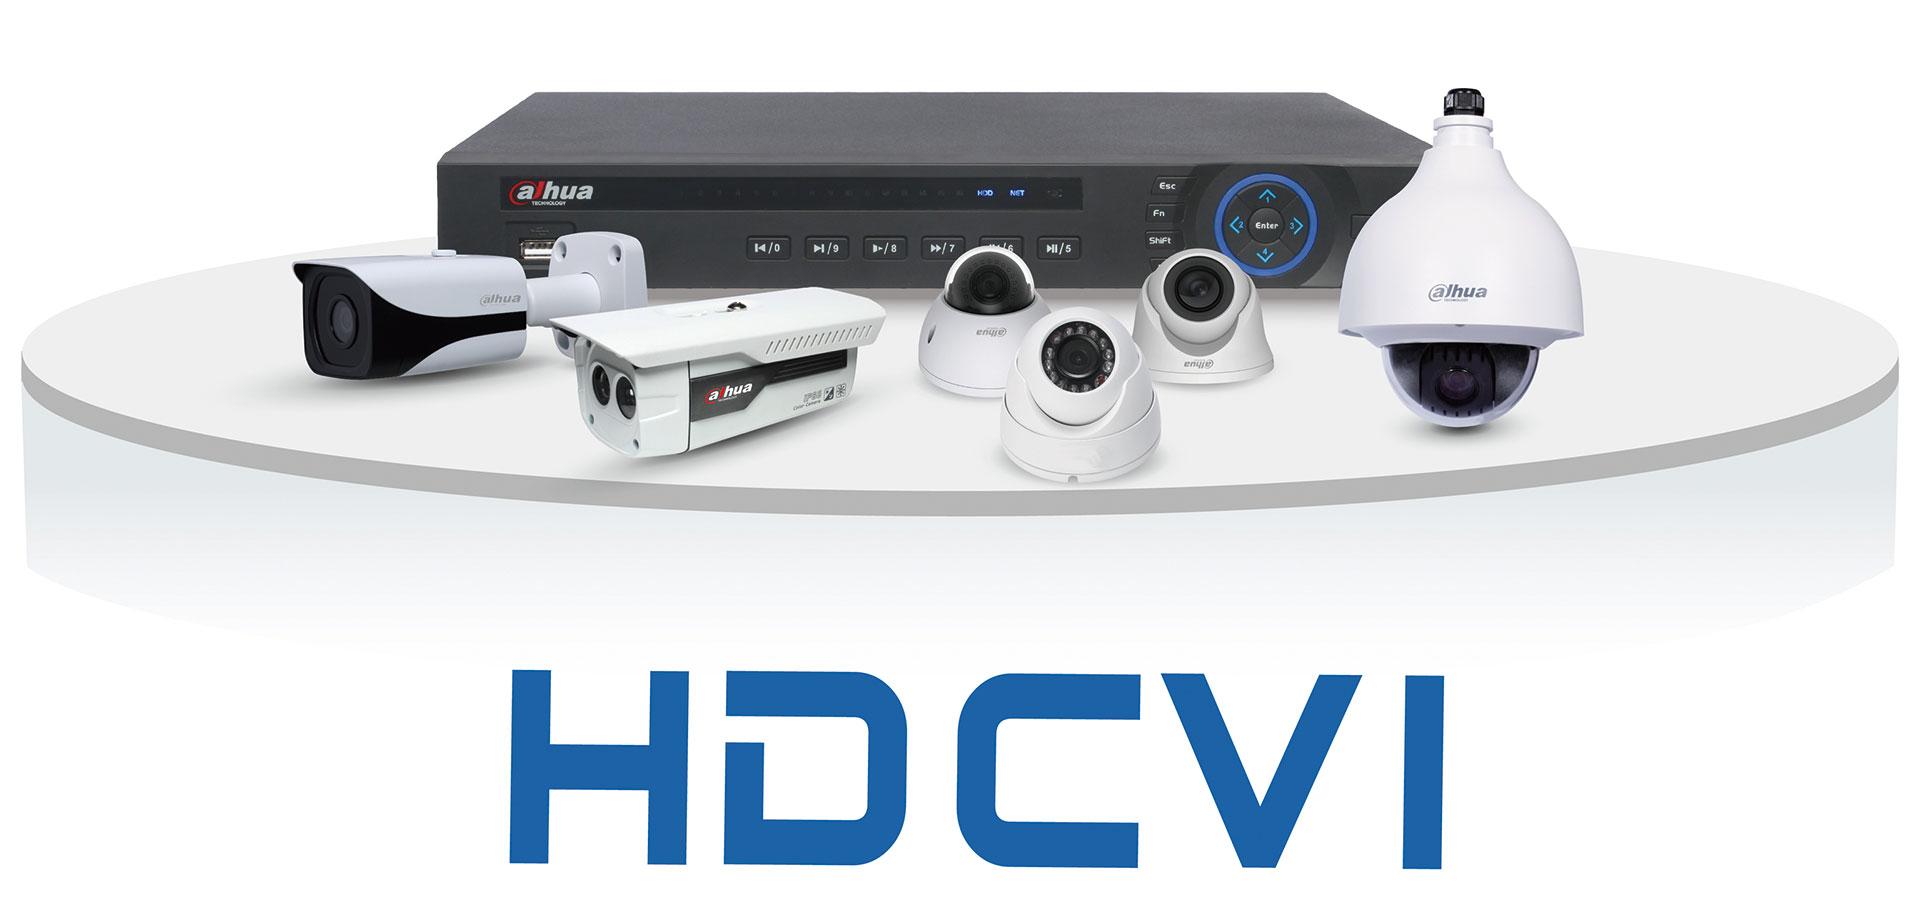 تکنولوژی HDCVI داهوا